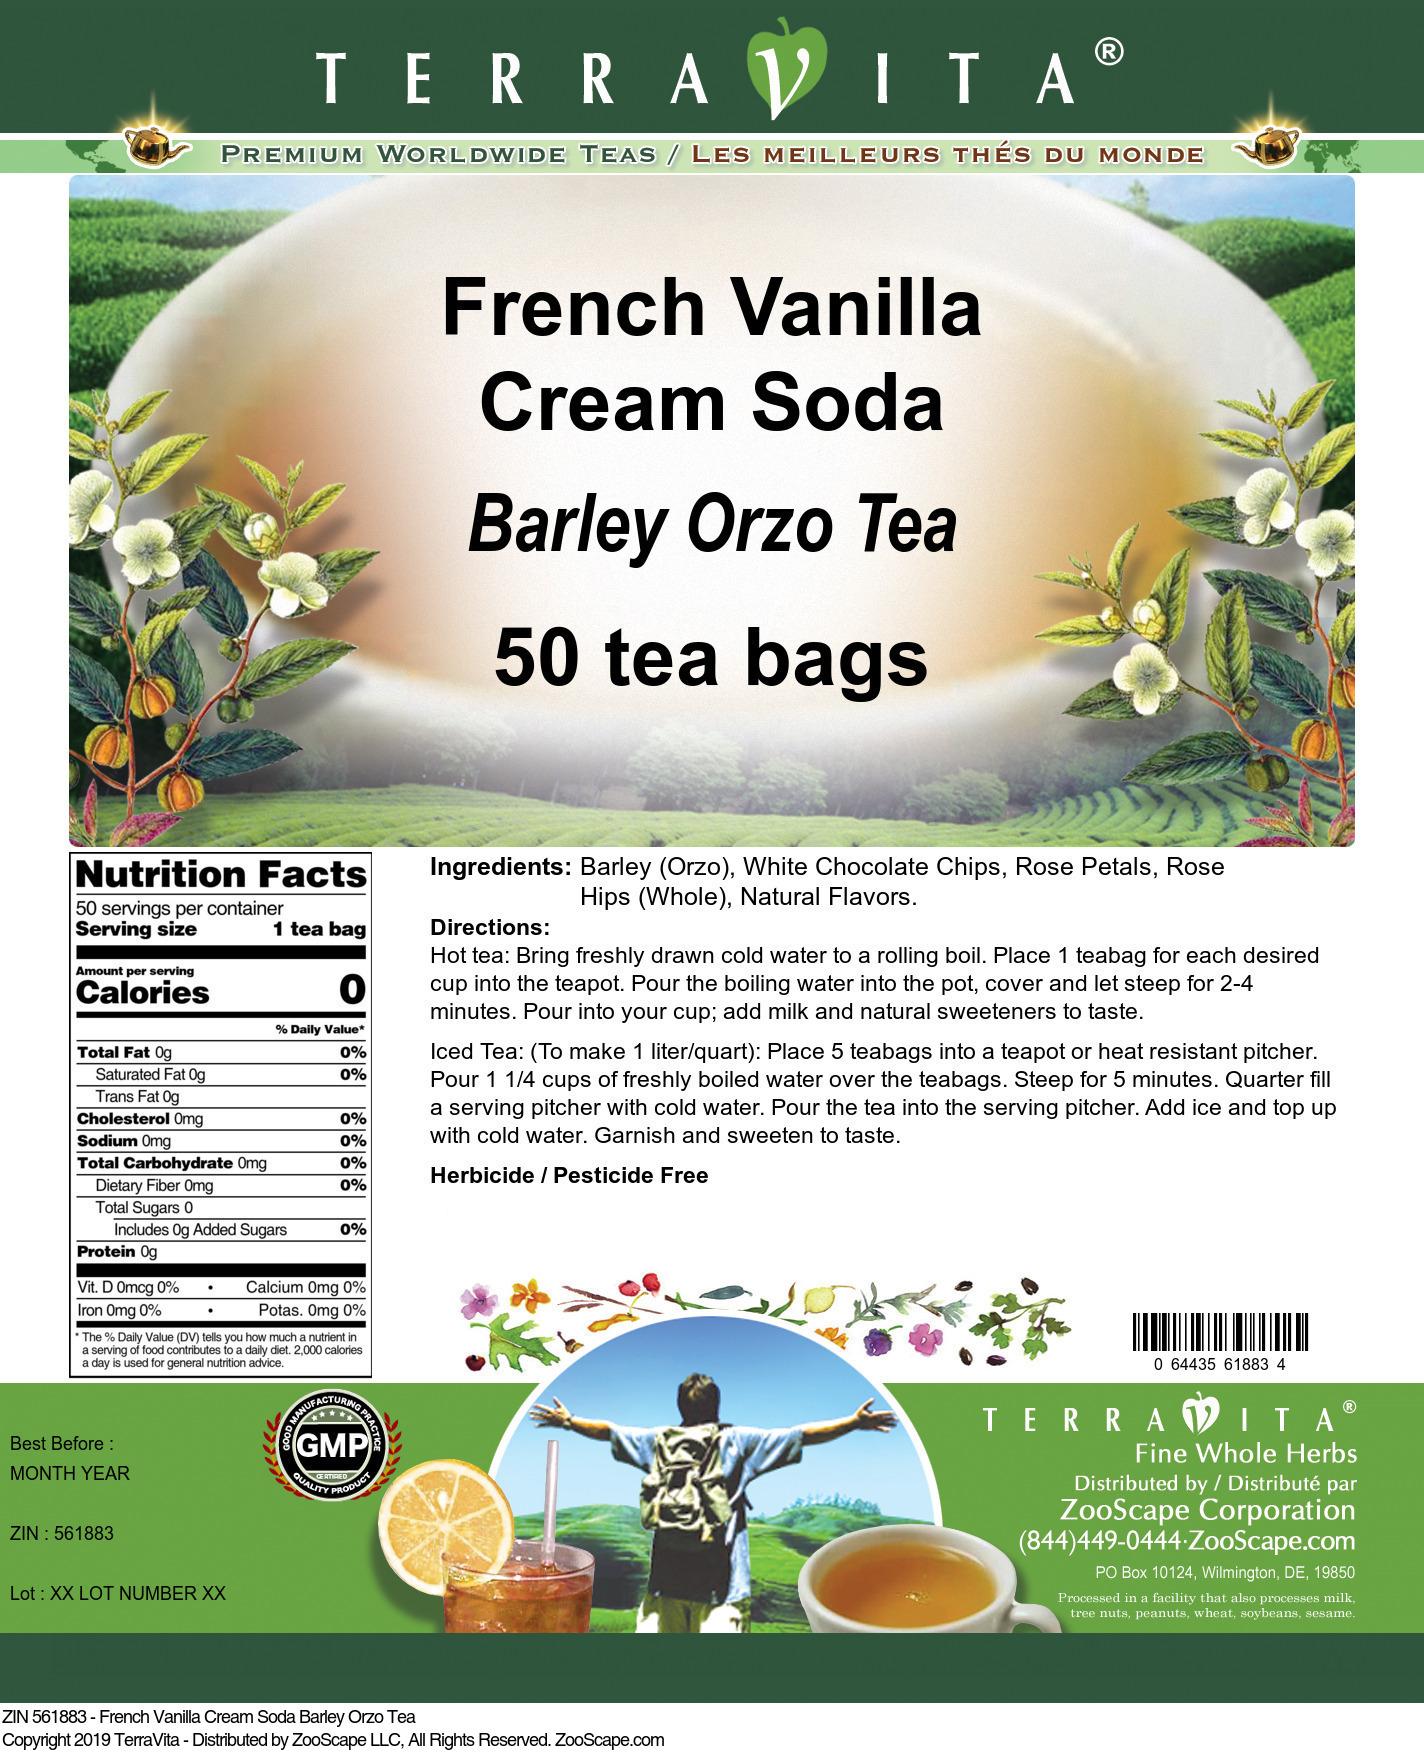 French Vanilla Cream Soda Barley Orzo